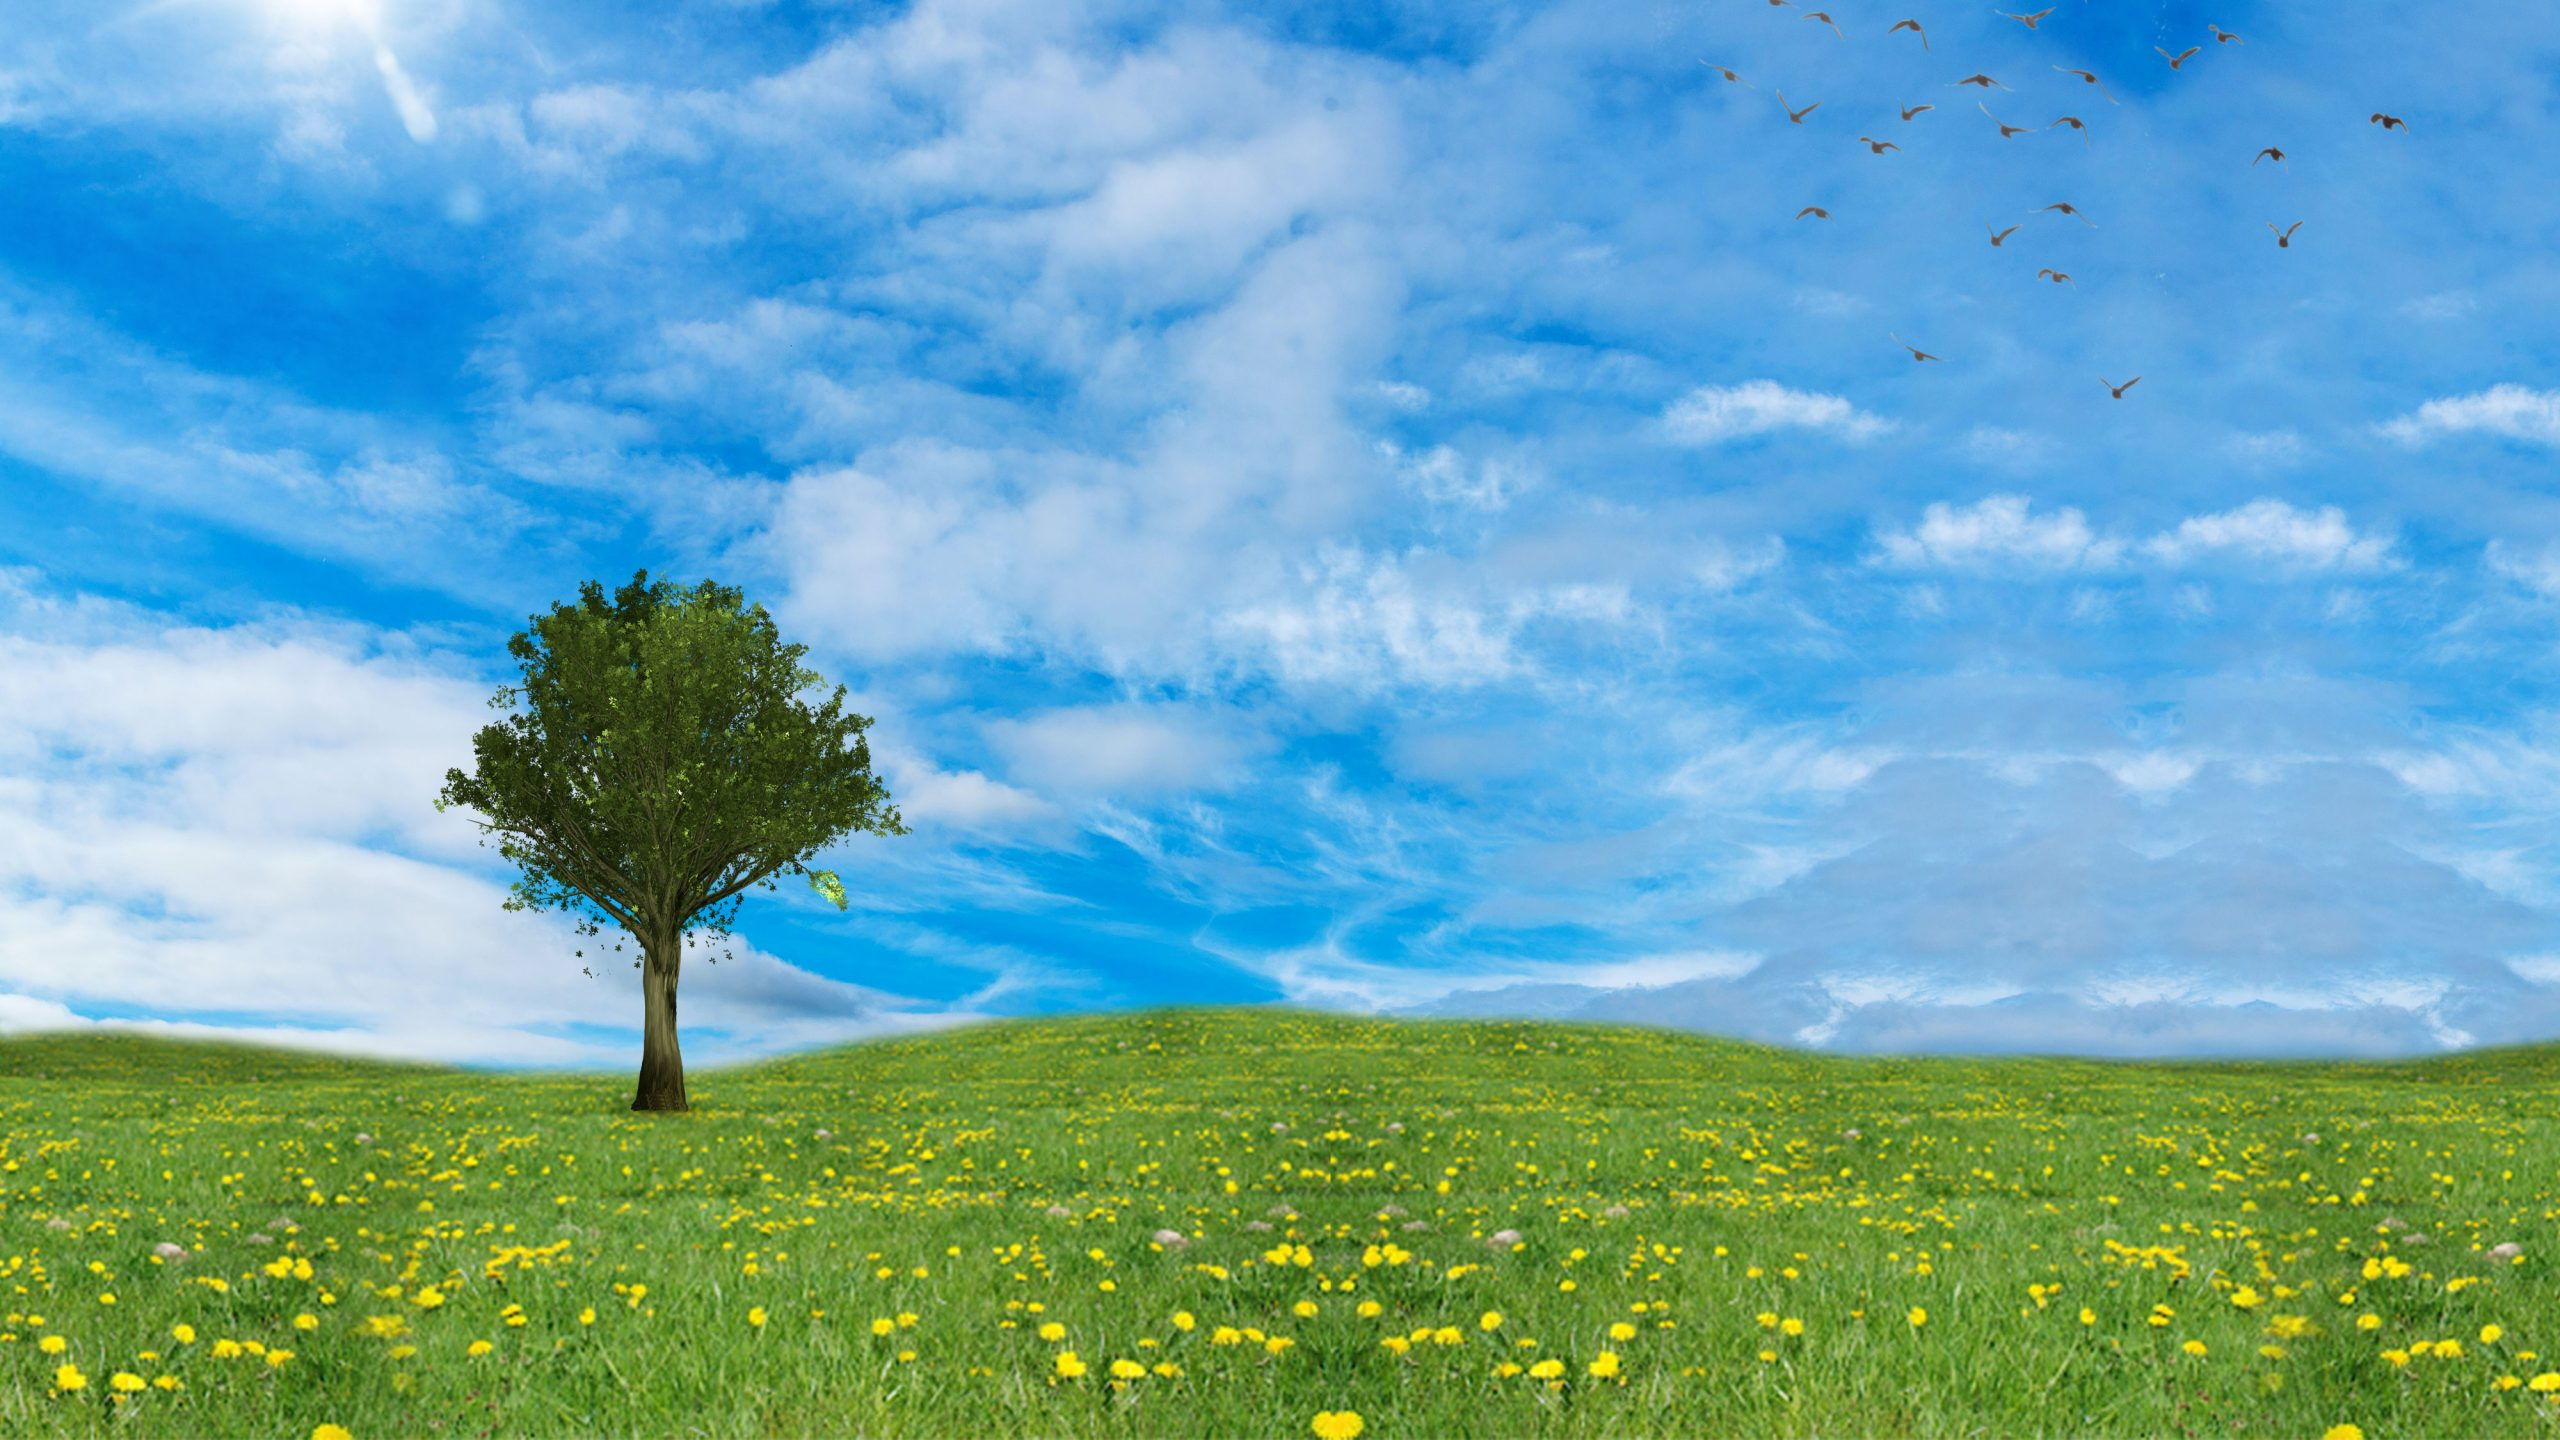 grass-field-tree-blue-sky-background